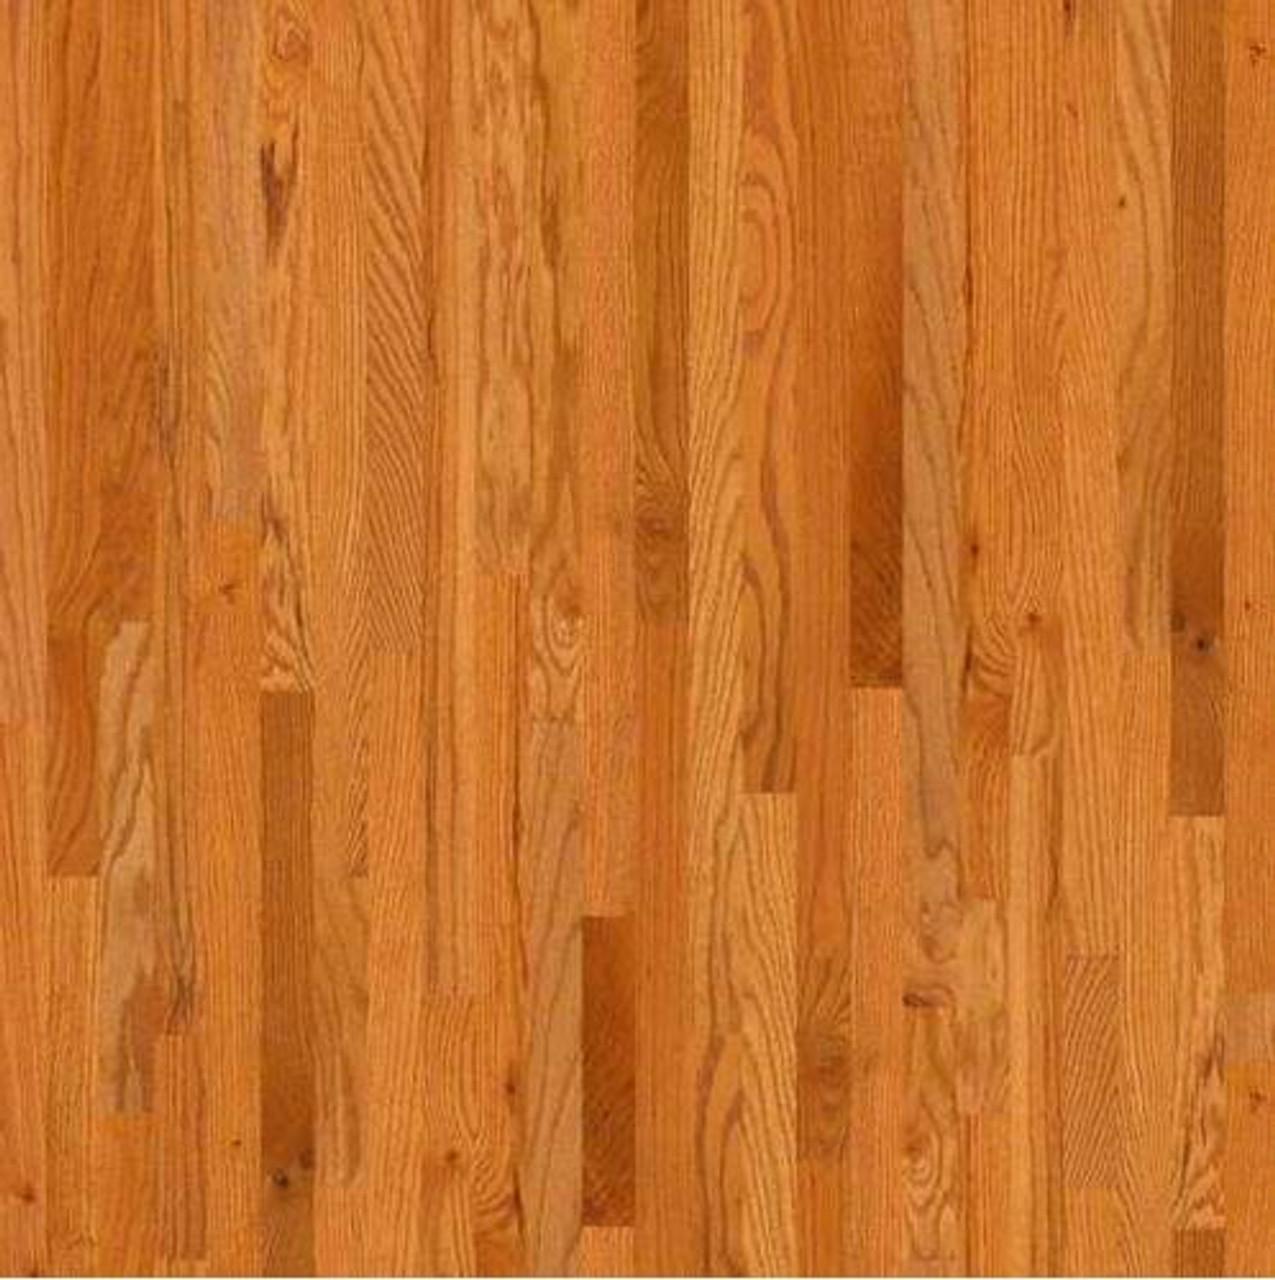 "Shaw Butterscotch   3-1/4"" x 3/4""   Solid Hardwood   1st Quality [27 SF / Box]"